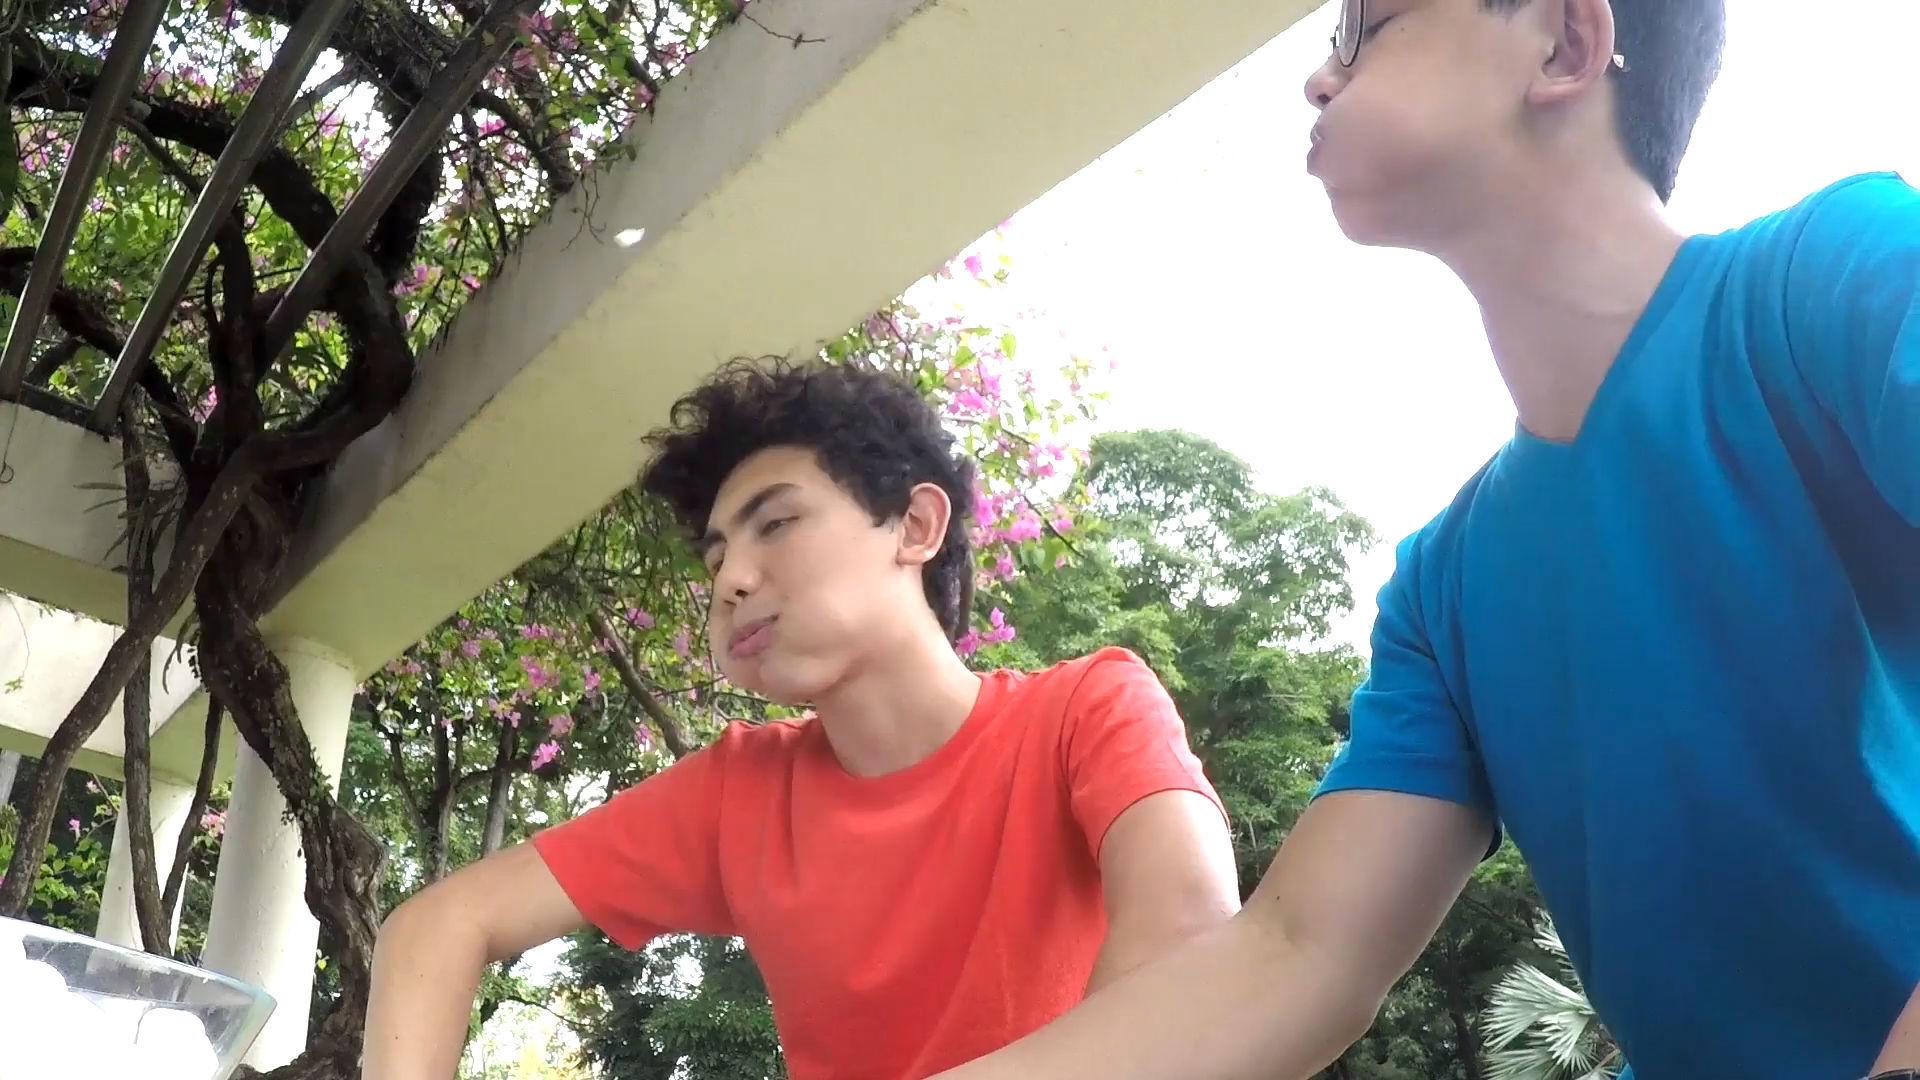 Zack & Xander Episode 4 Chubby Bunny Teaser | Zack & Xander CAN! Web Series